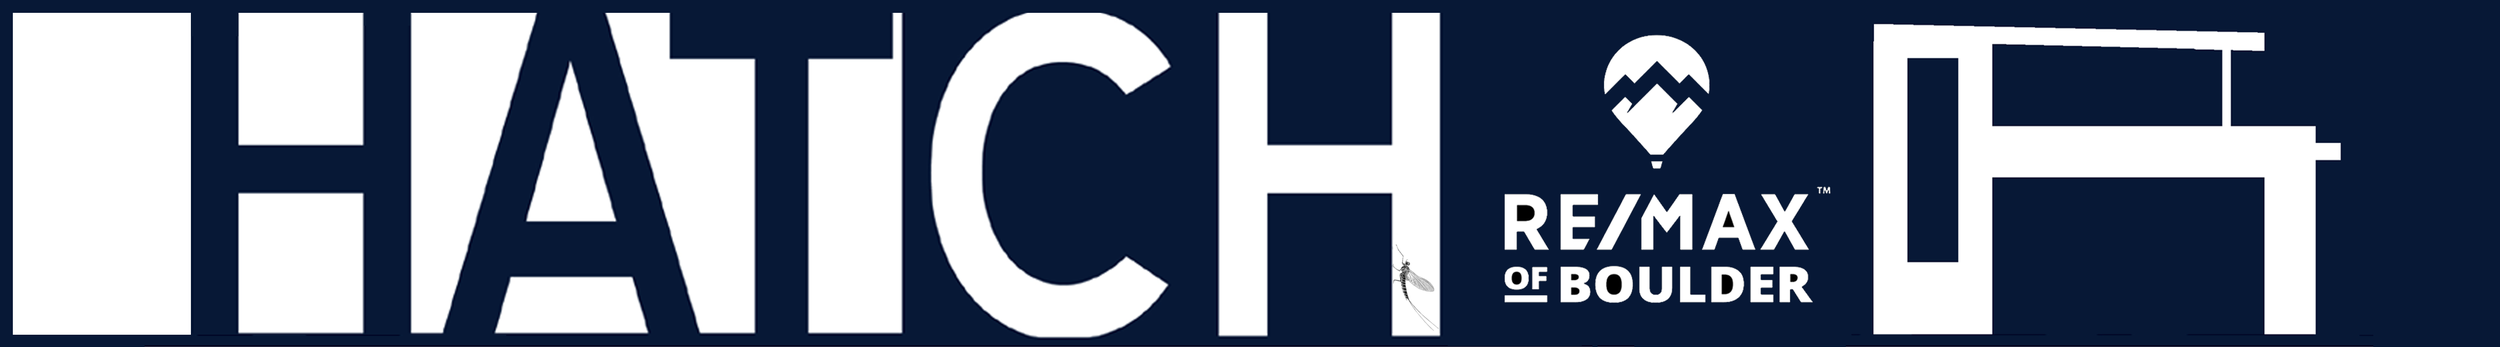 HATCH.COM BANNER.png